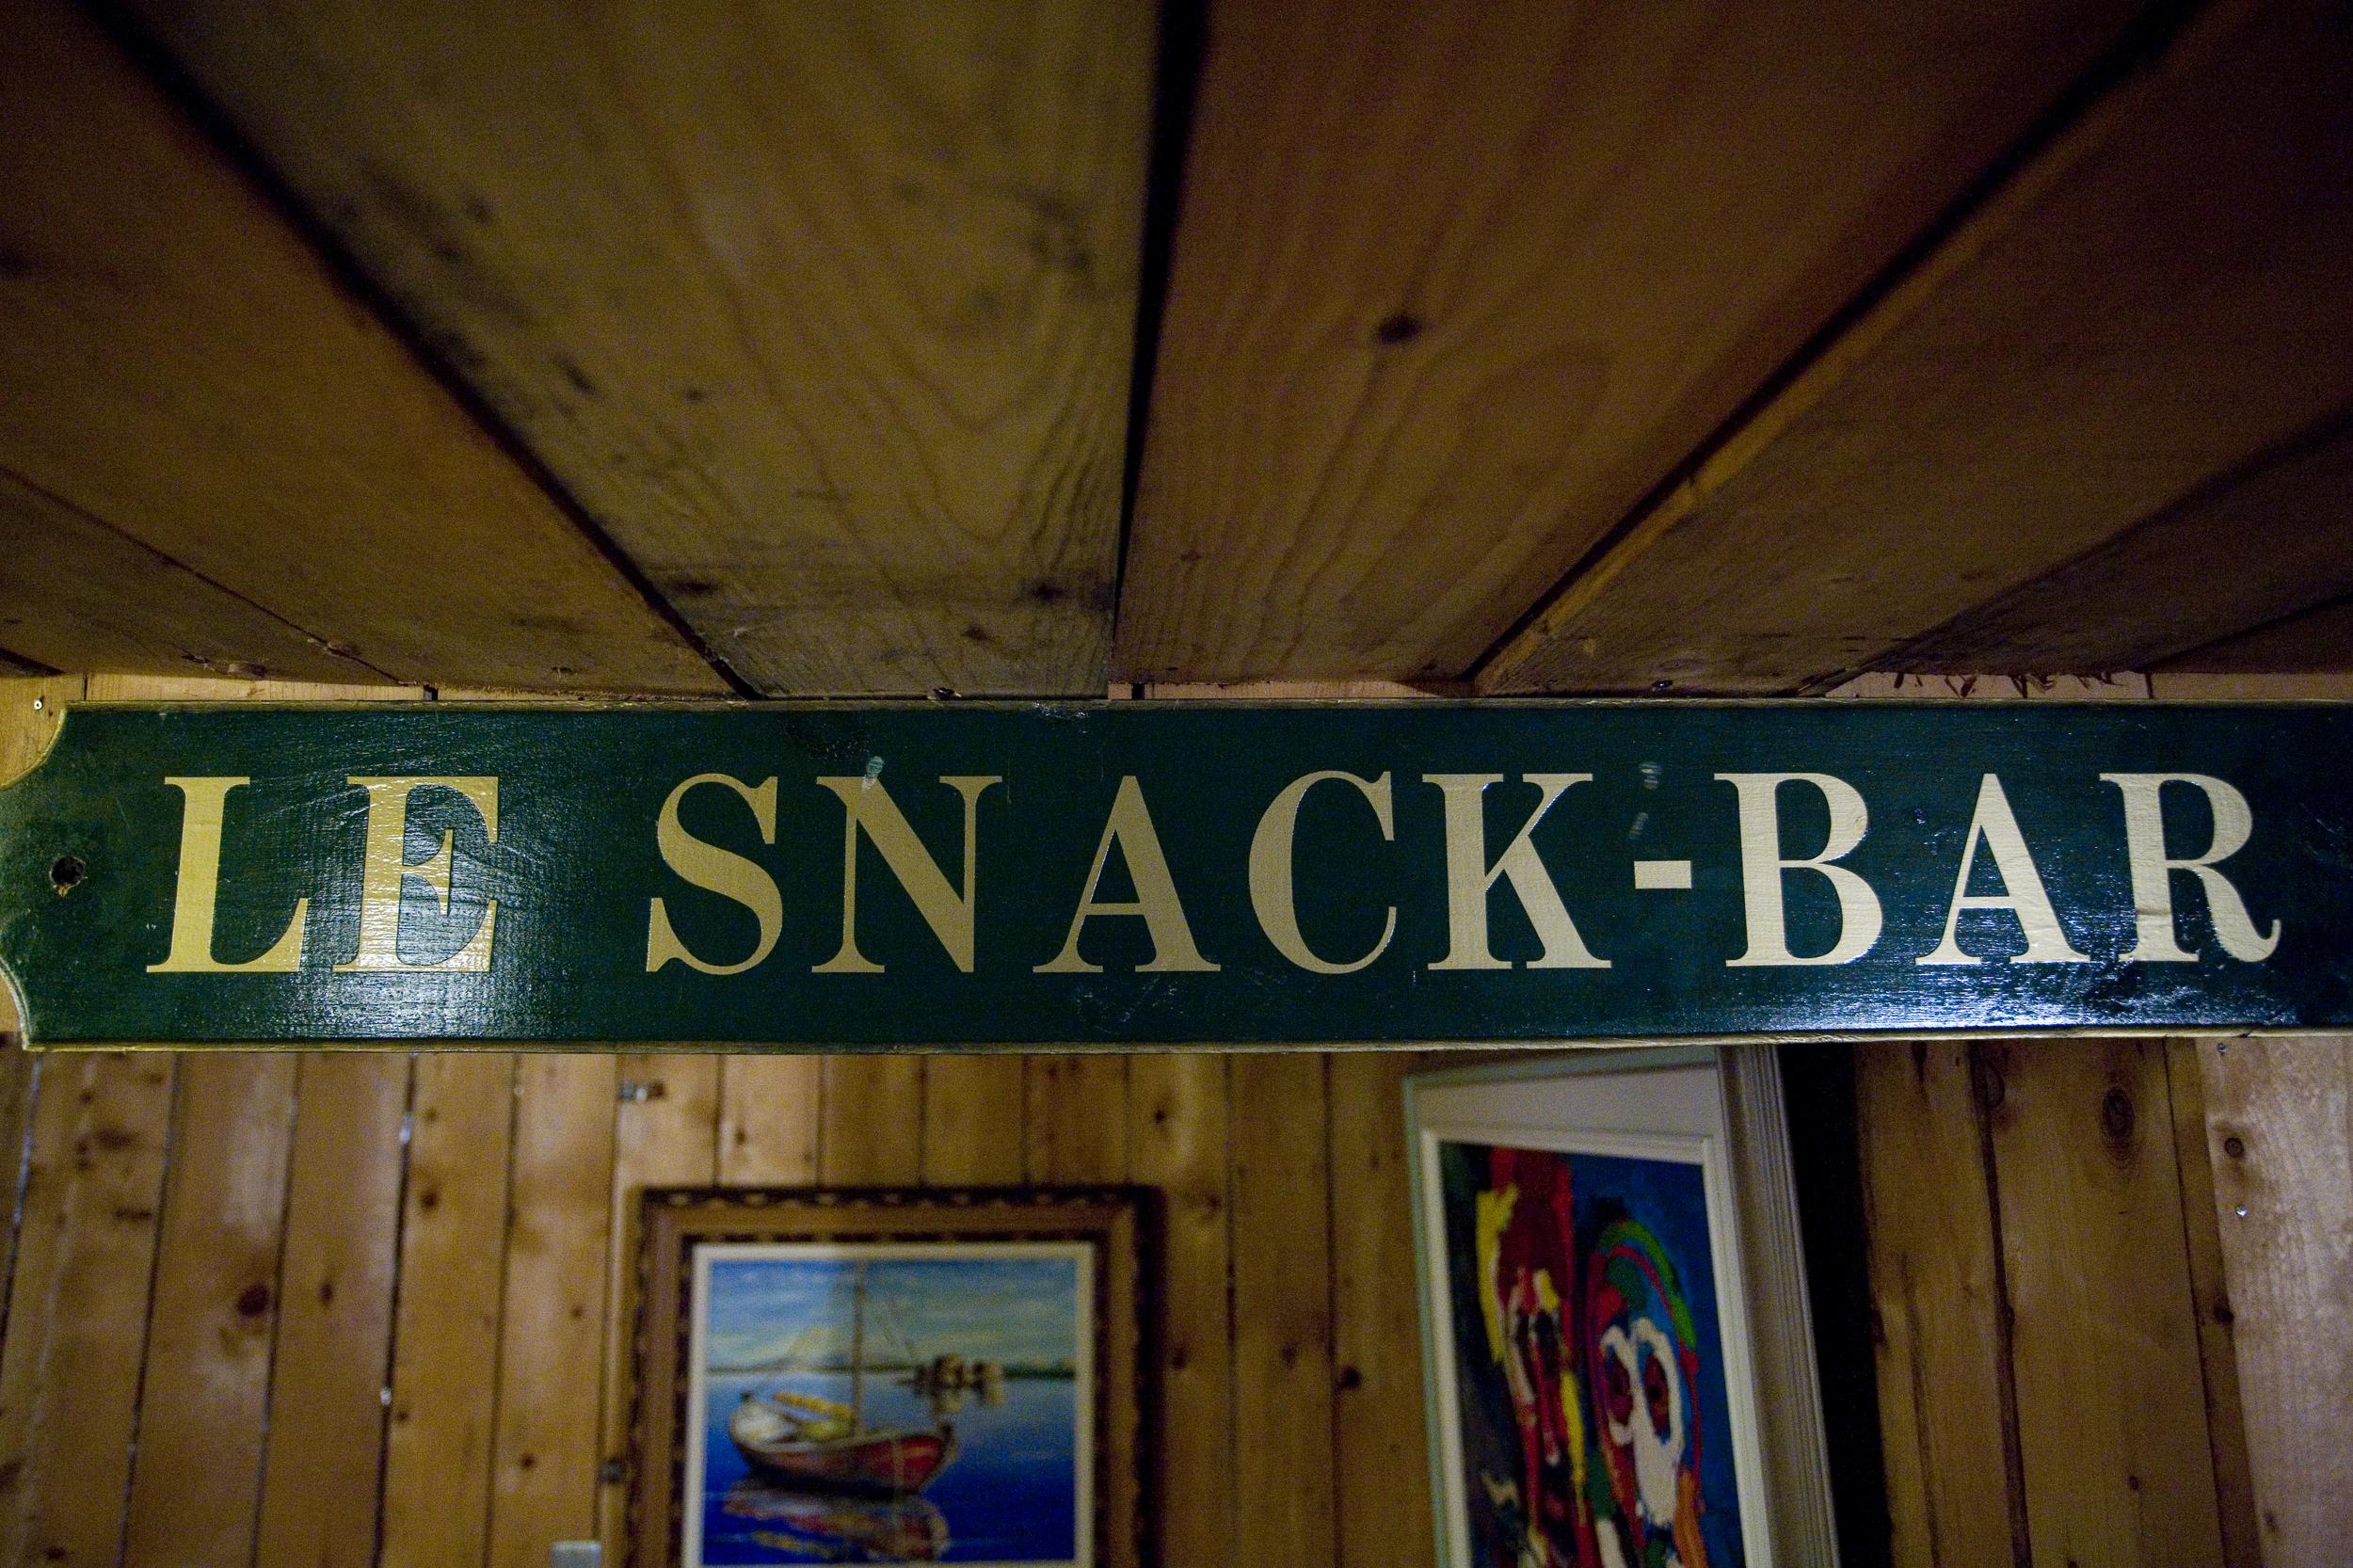 Snack Bar sign